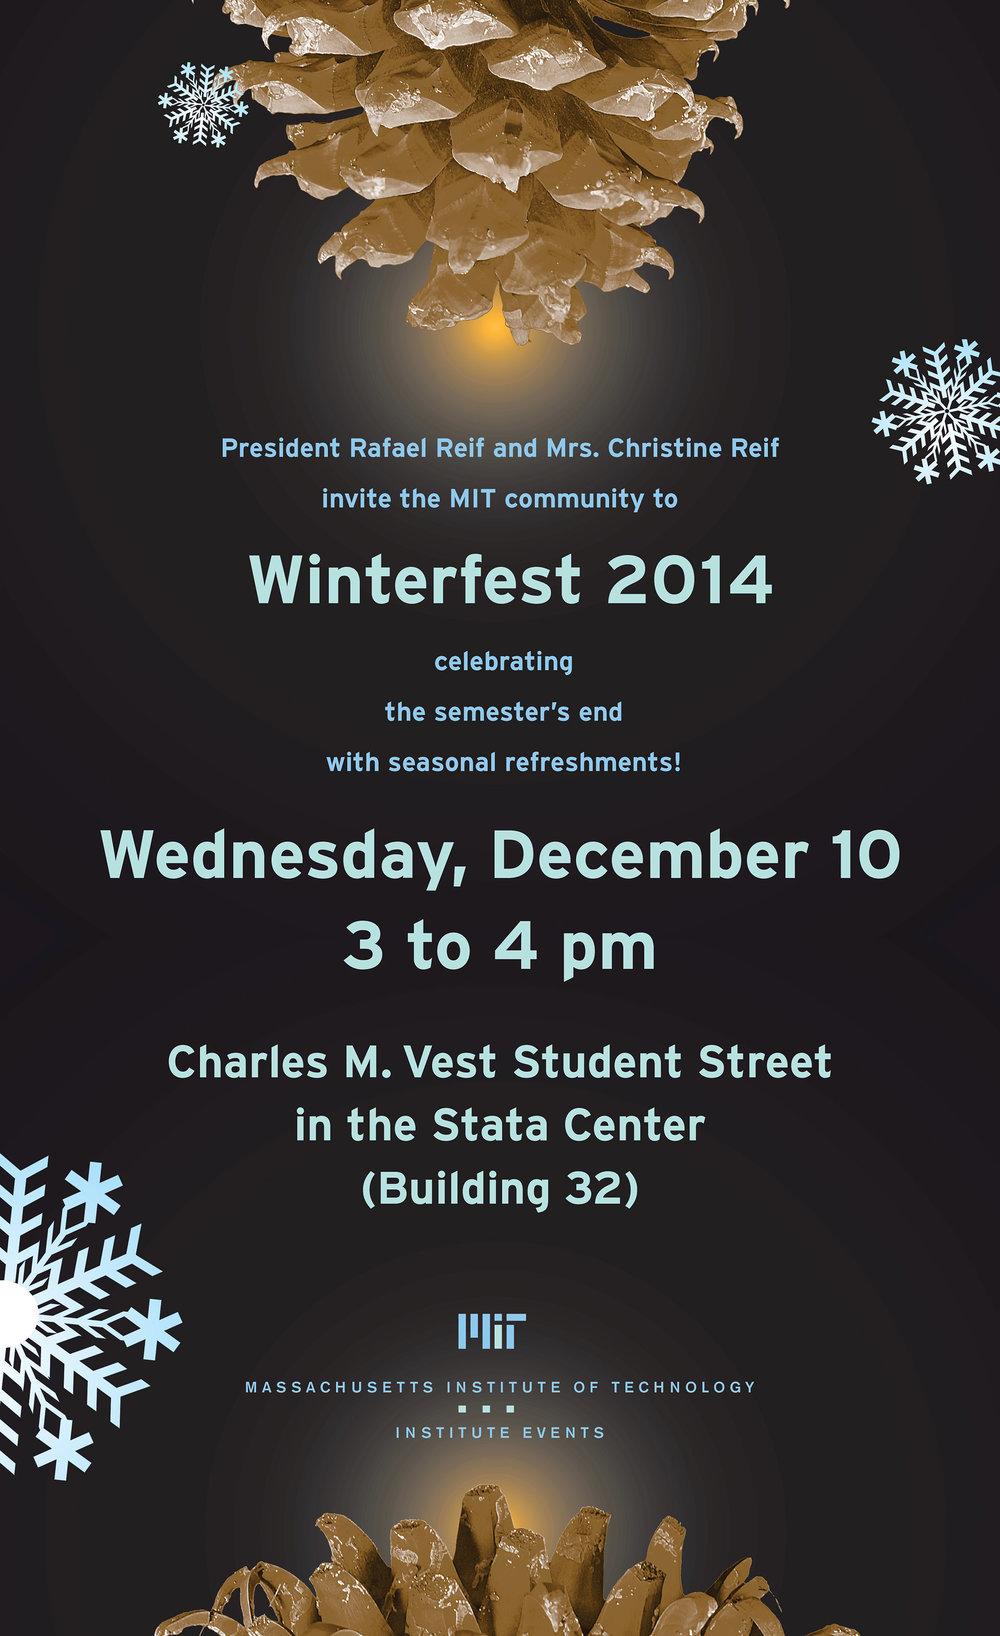 Winterfest event poster